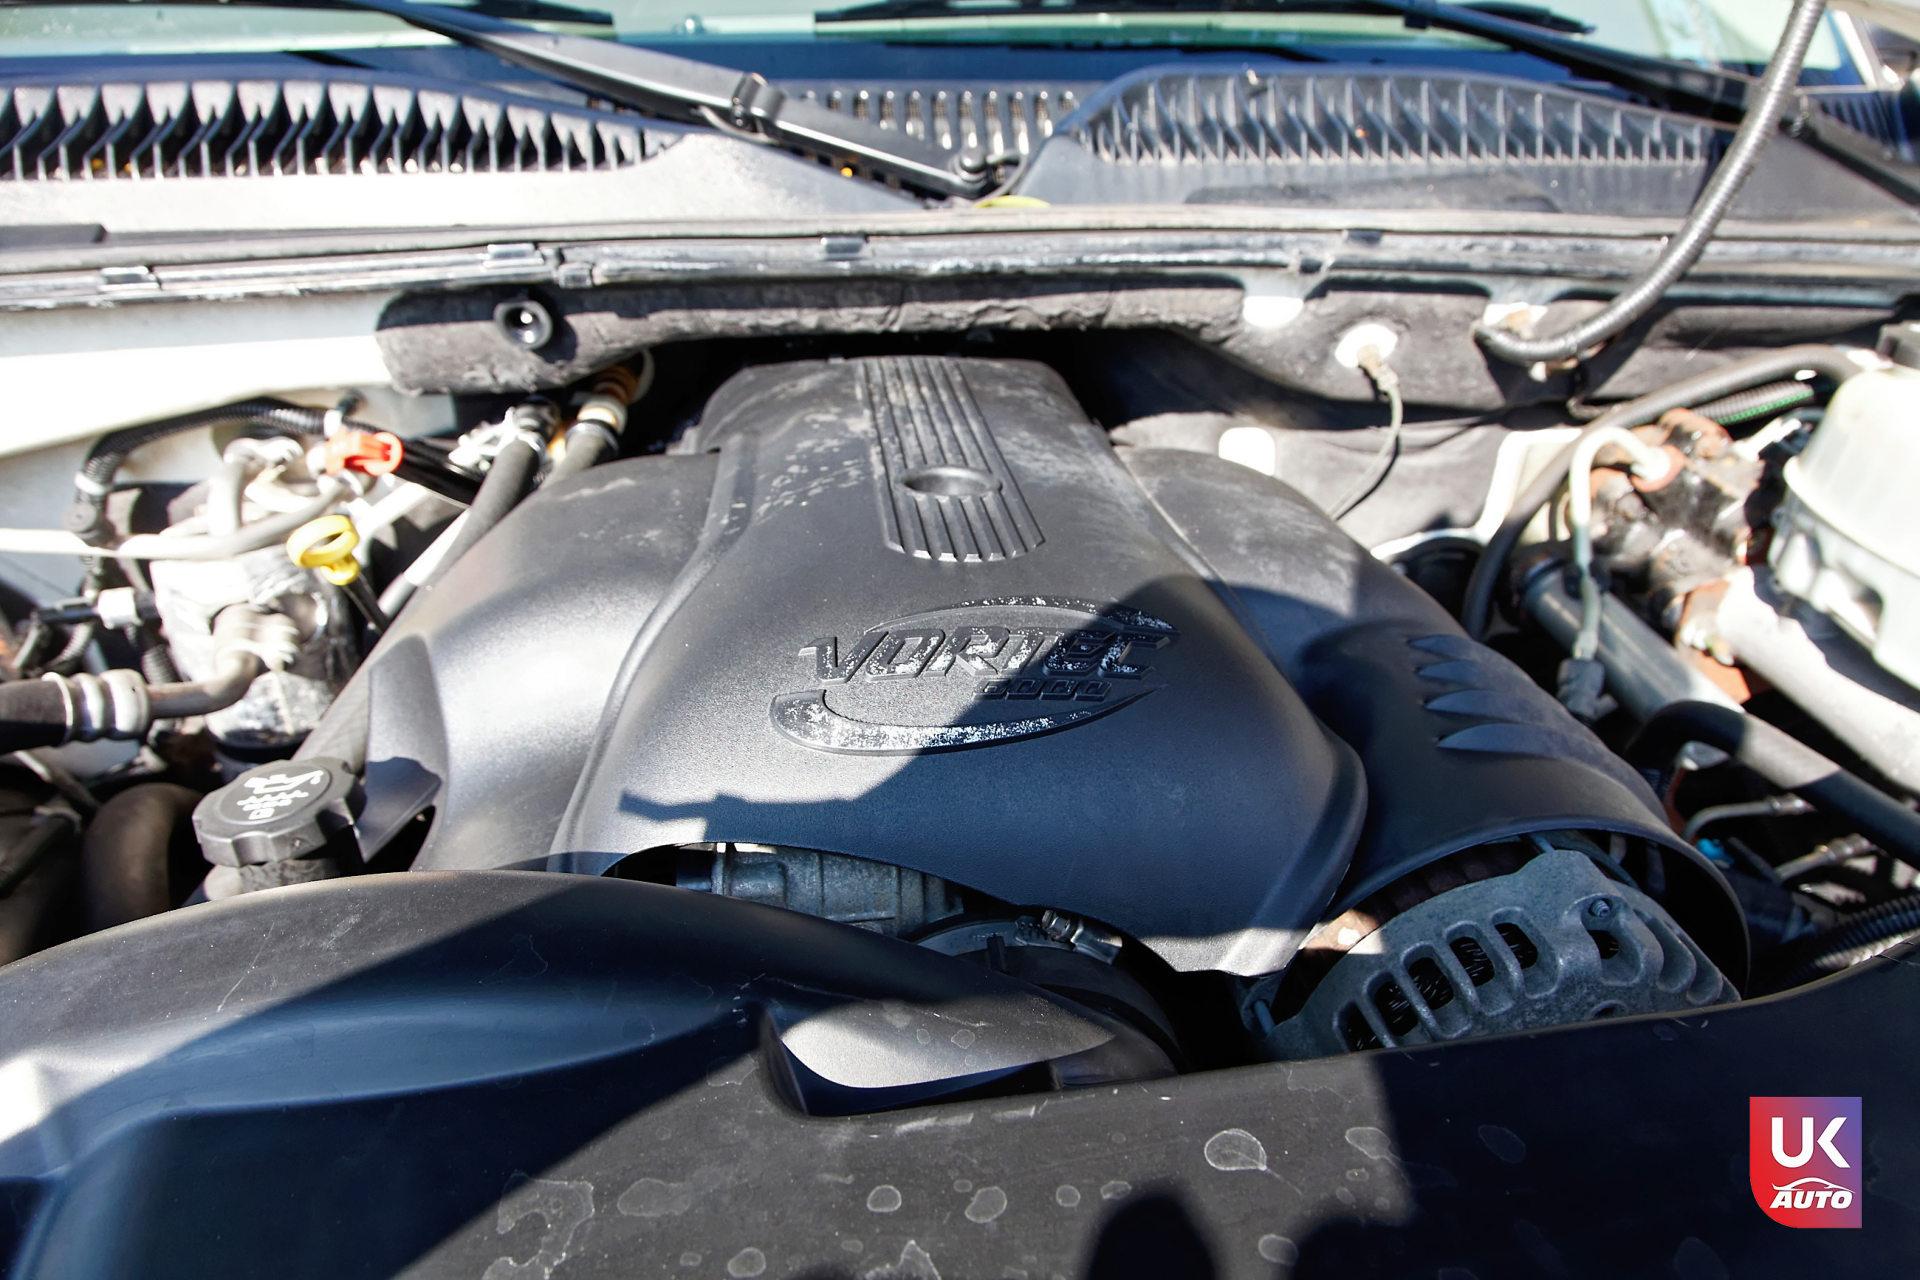 Cadillac Escalade lhd import cadillac angleterre cadillac uk ukauto us import lhd11 DxO - AUTO IMPORT CADILLAC ESCALADE V8 LHD IMPORTATION CADILLAC LHD FELICITATION A BERTRAND